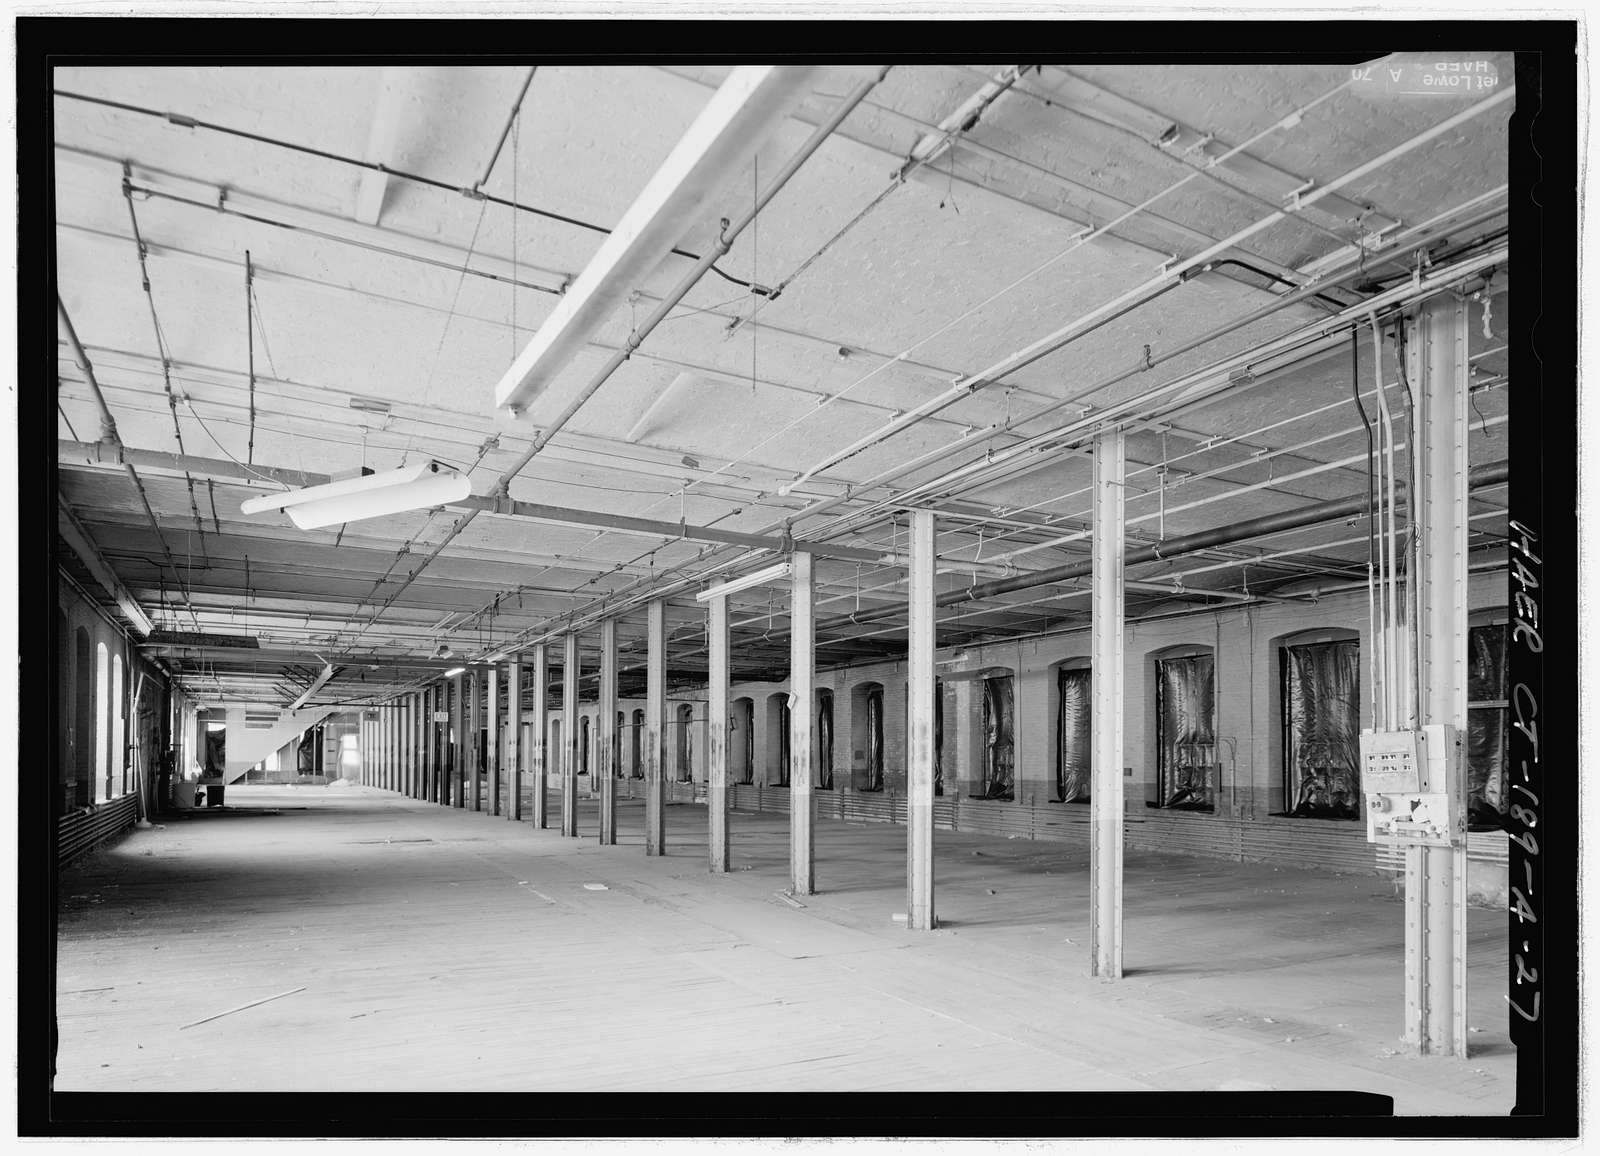 Colt Fire Arms Company, East Armory Building, 36-150 Huyshope Avenue, 17-170 Van Dyke Avenue, 49 Vredendale Avenue, Hartford, Hartford County, CT